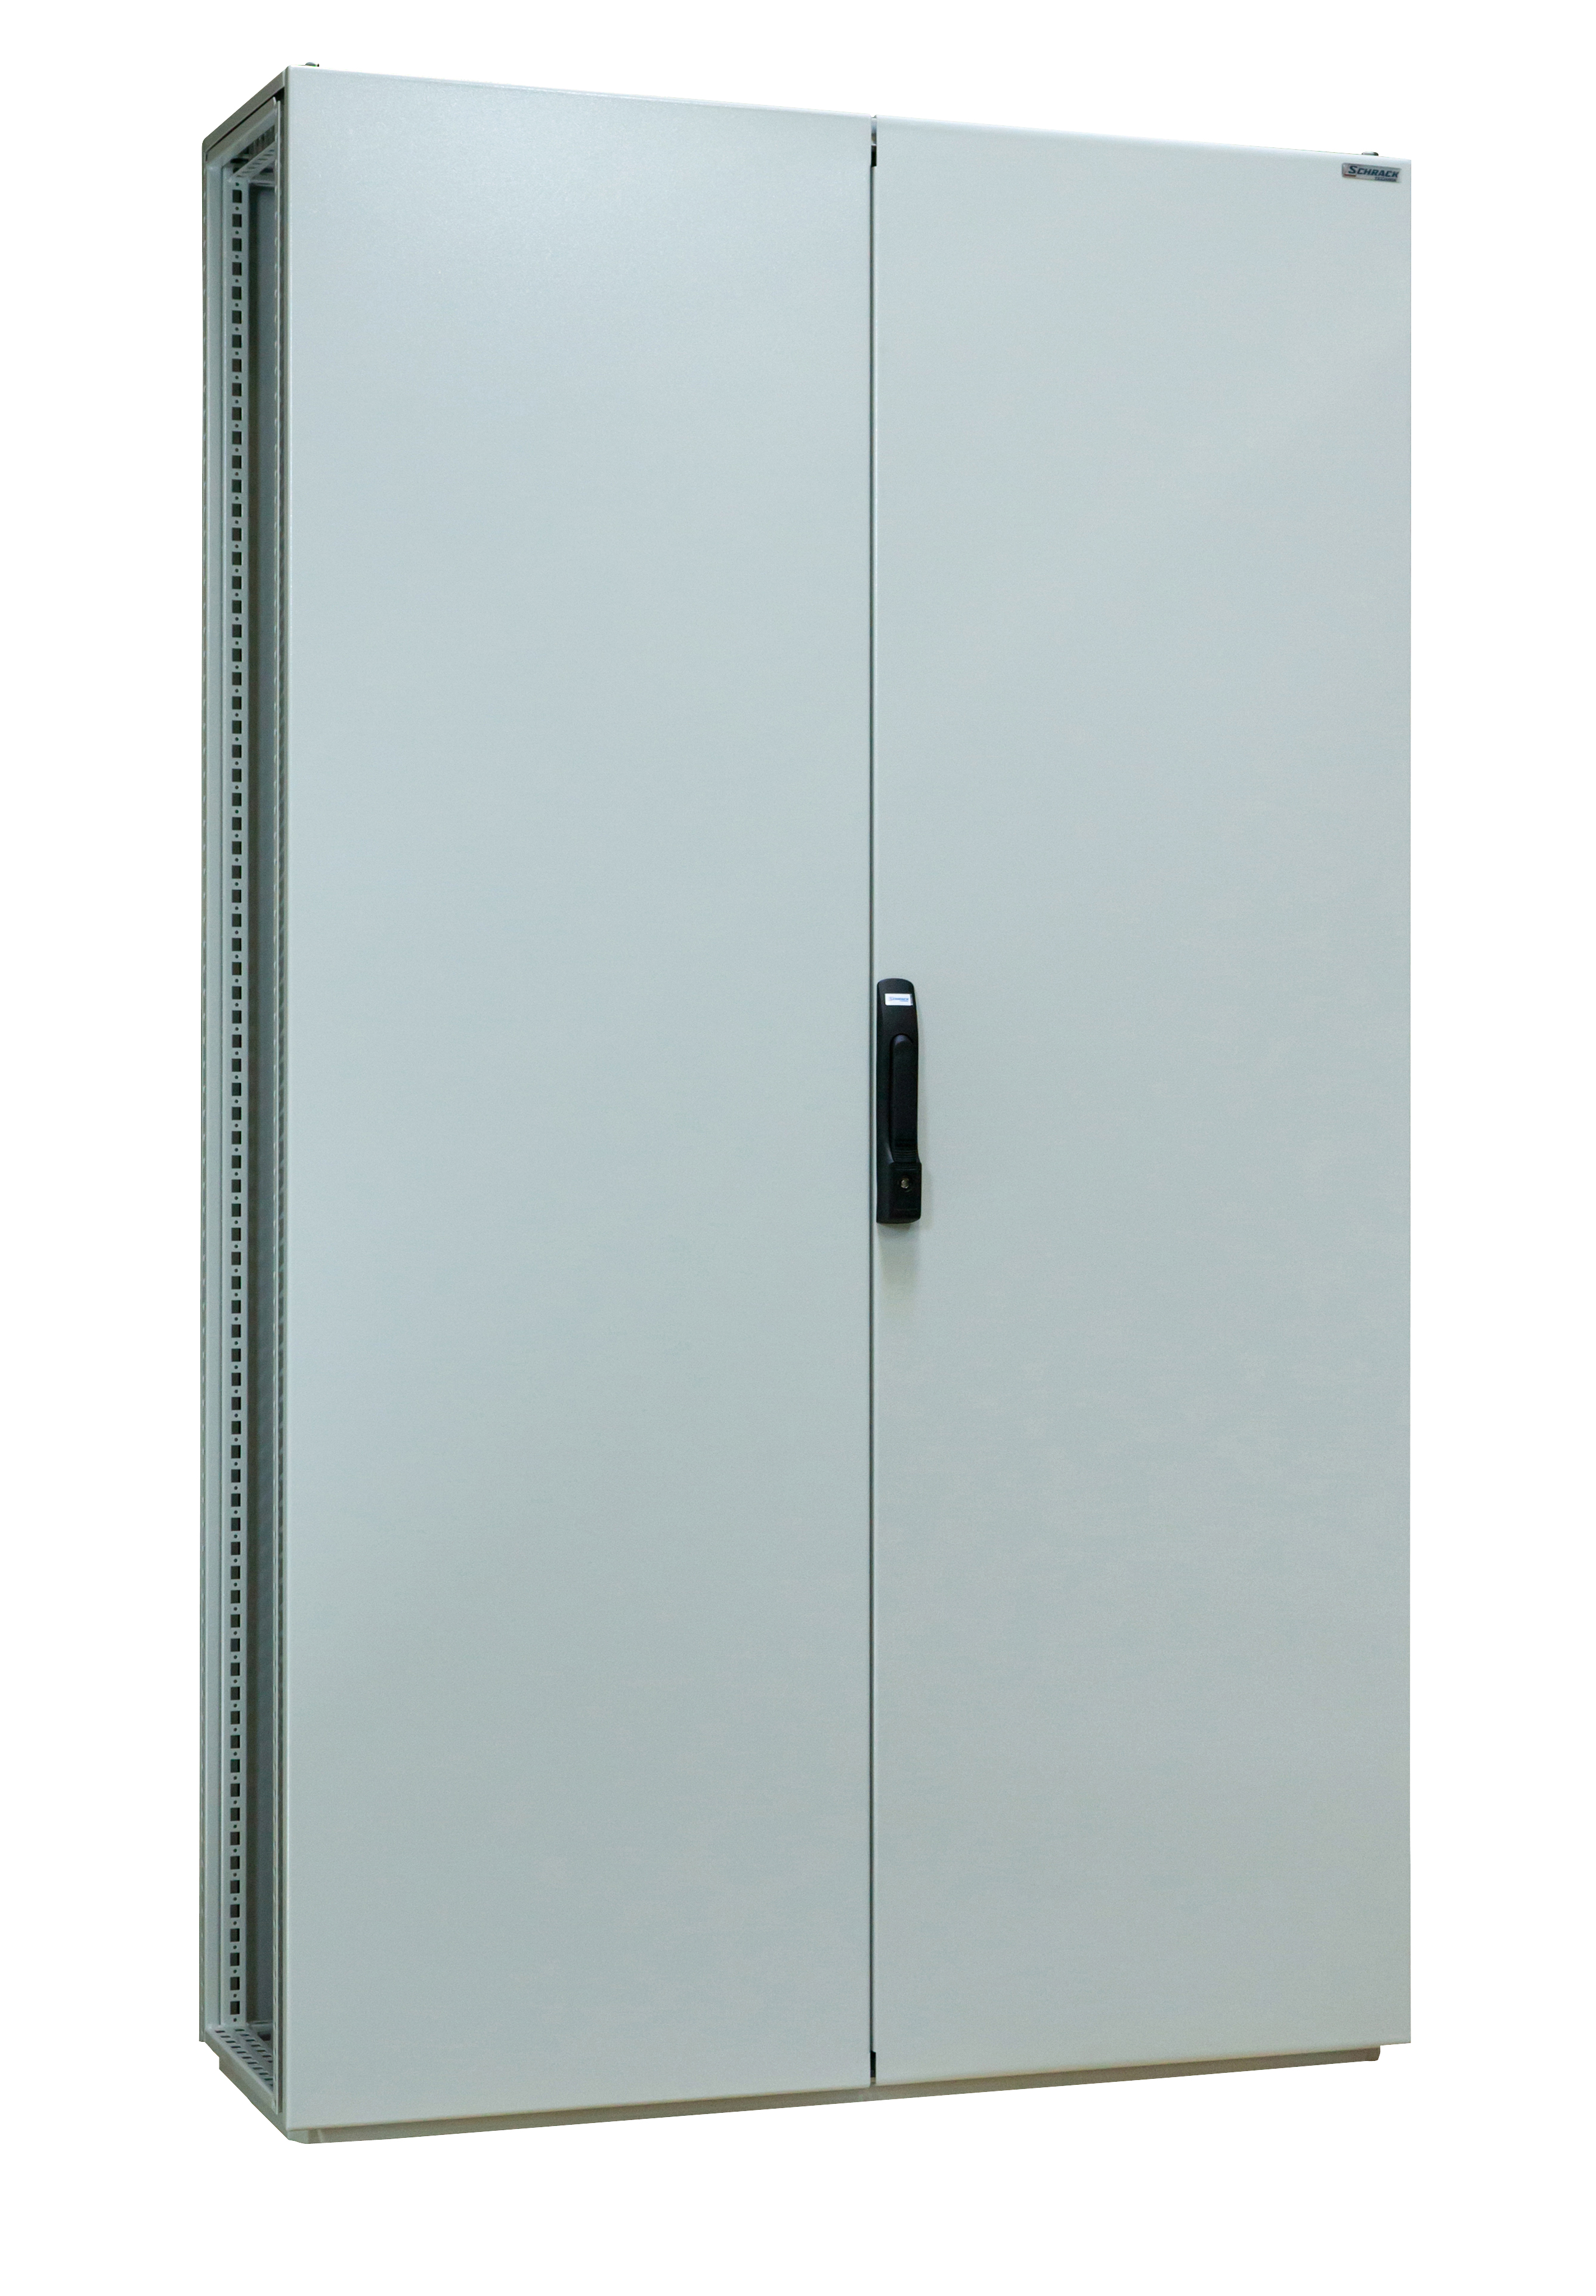 1 Stk Anreihschrank 2-türig, 2000x1000x400mm, RAL 7035 AS201042-5